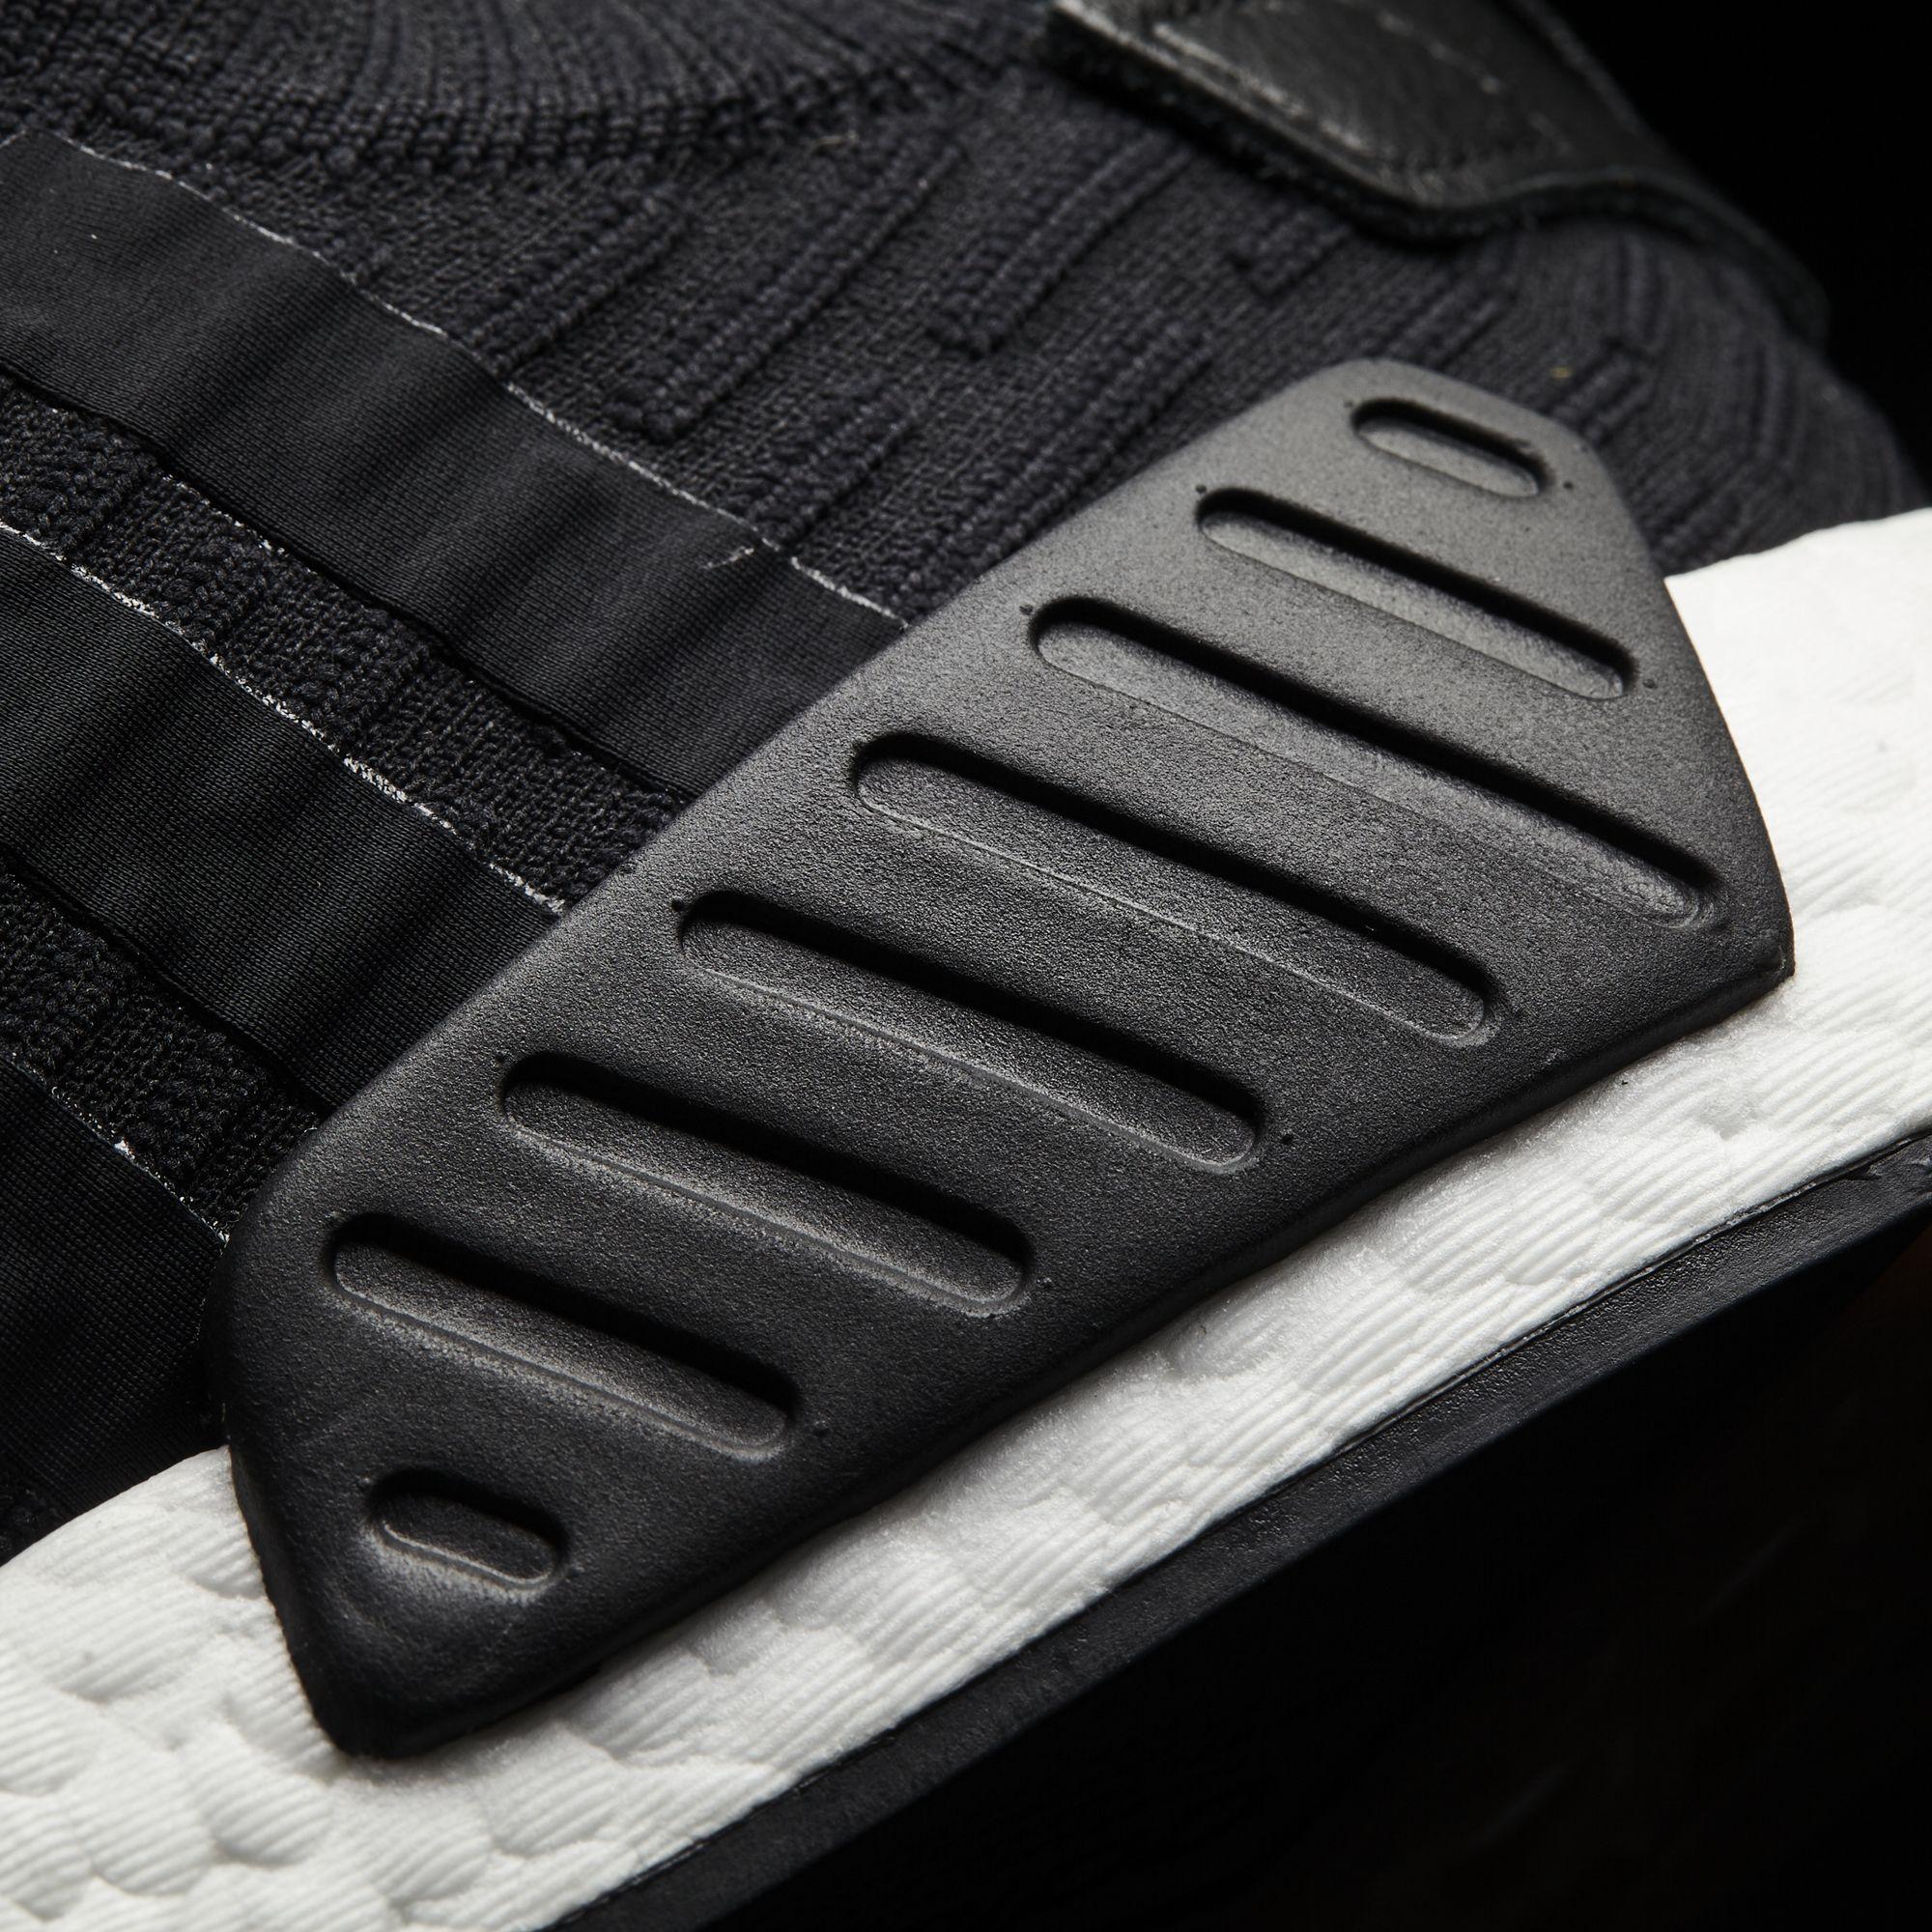 BY9696 adidas NMD R2 Primeknit Core Black 5